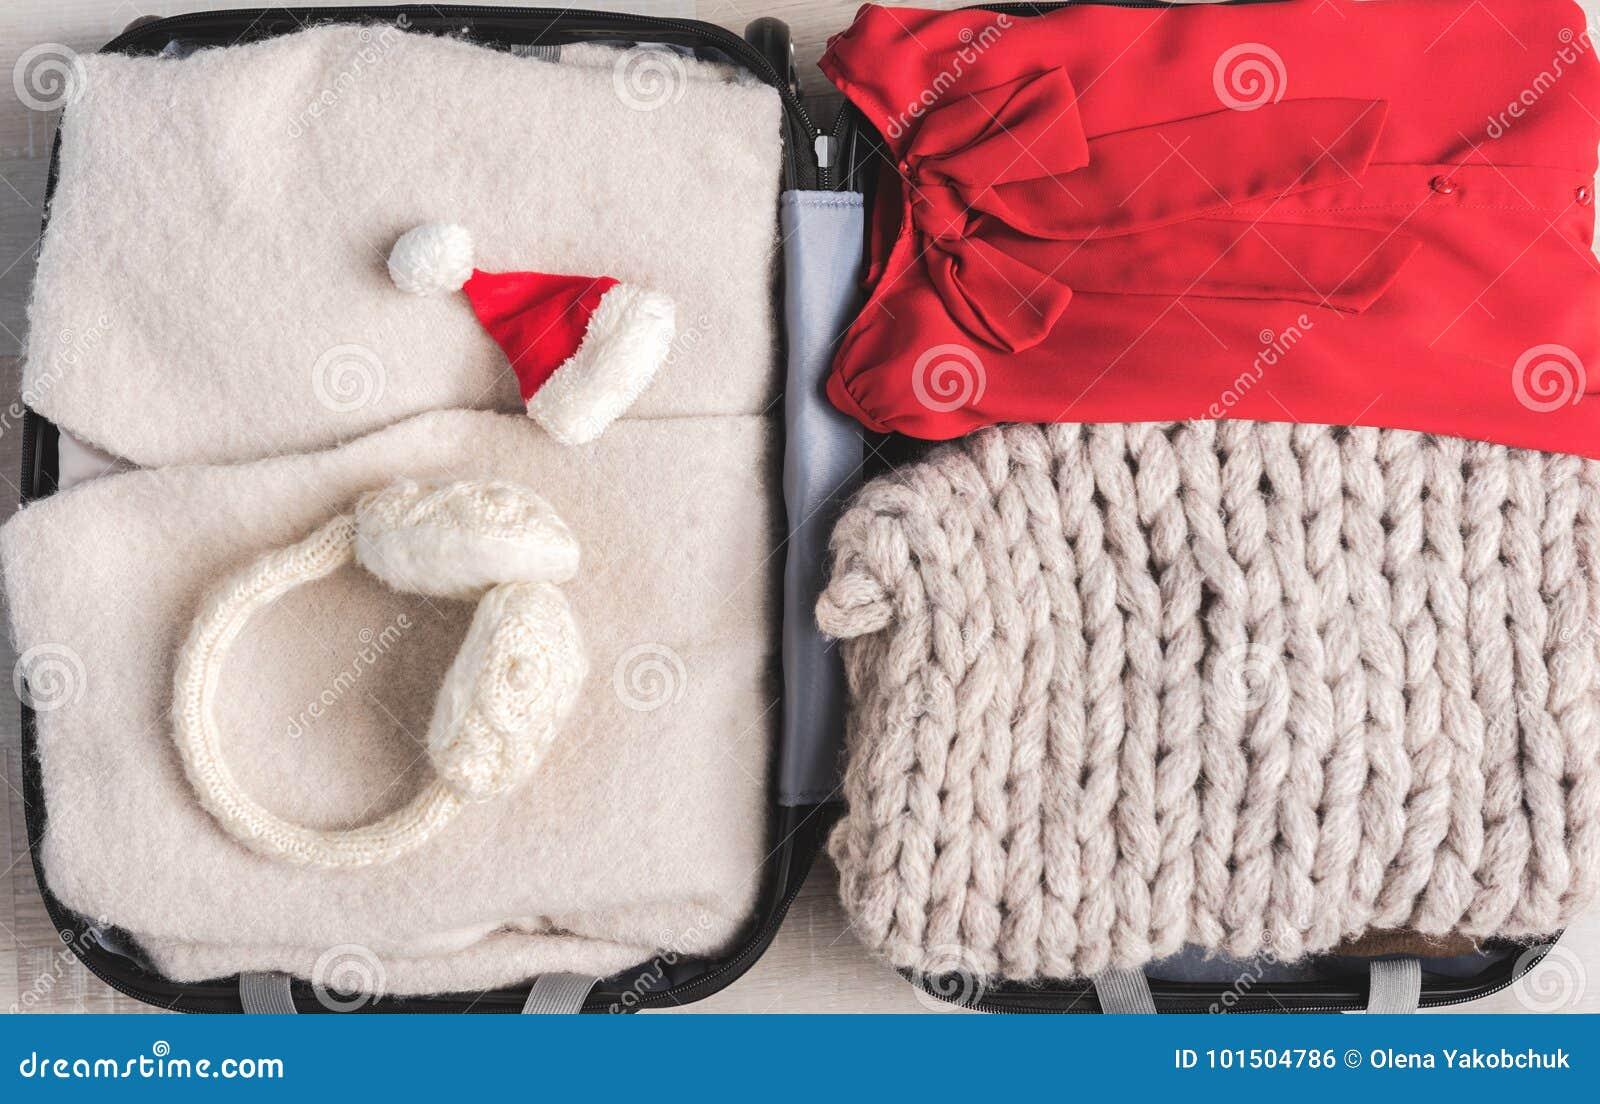 2e62d77e2e6 Female Clothes In Open Suitcase Stock Photo - Image of casual ...